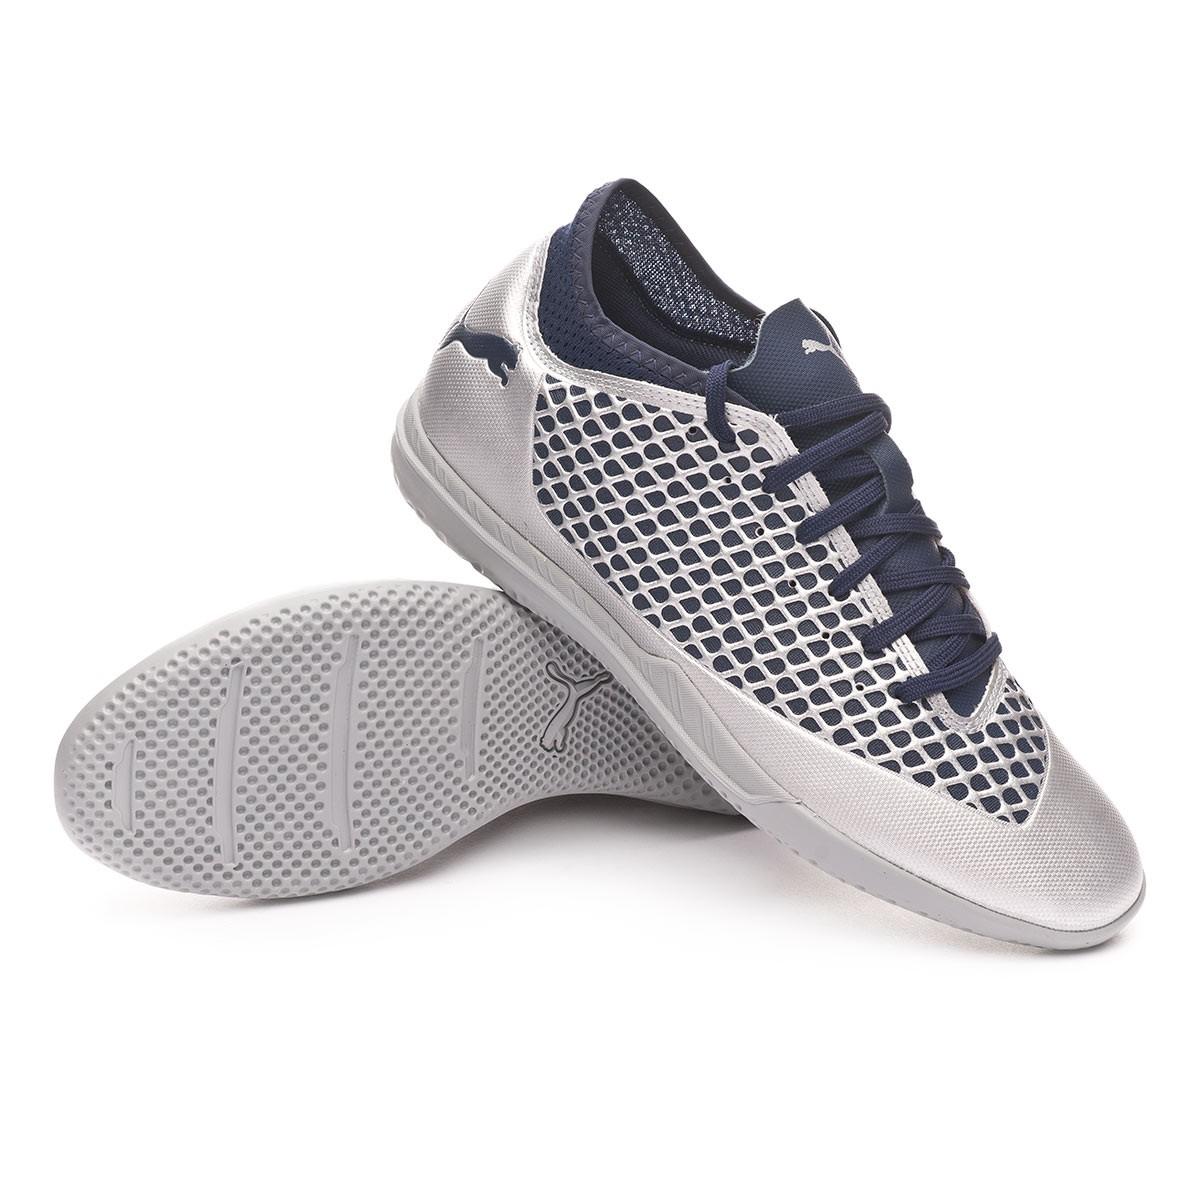 36d011240d4 Futsal Boot Puma Future 2.4 IT Puma Silver-Peacoat - Football store Fútbol  Emotion